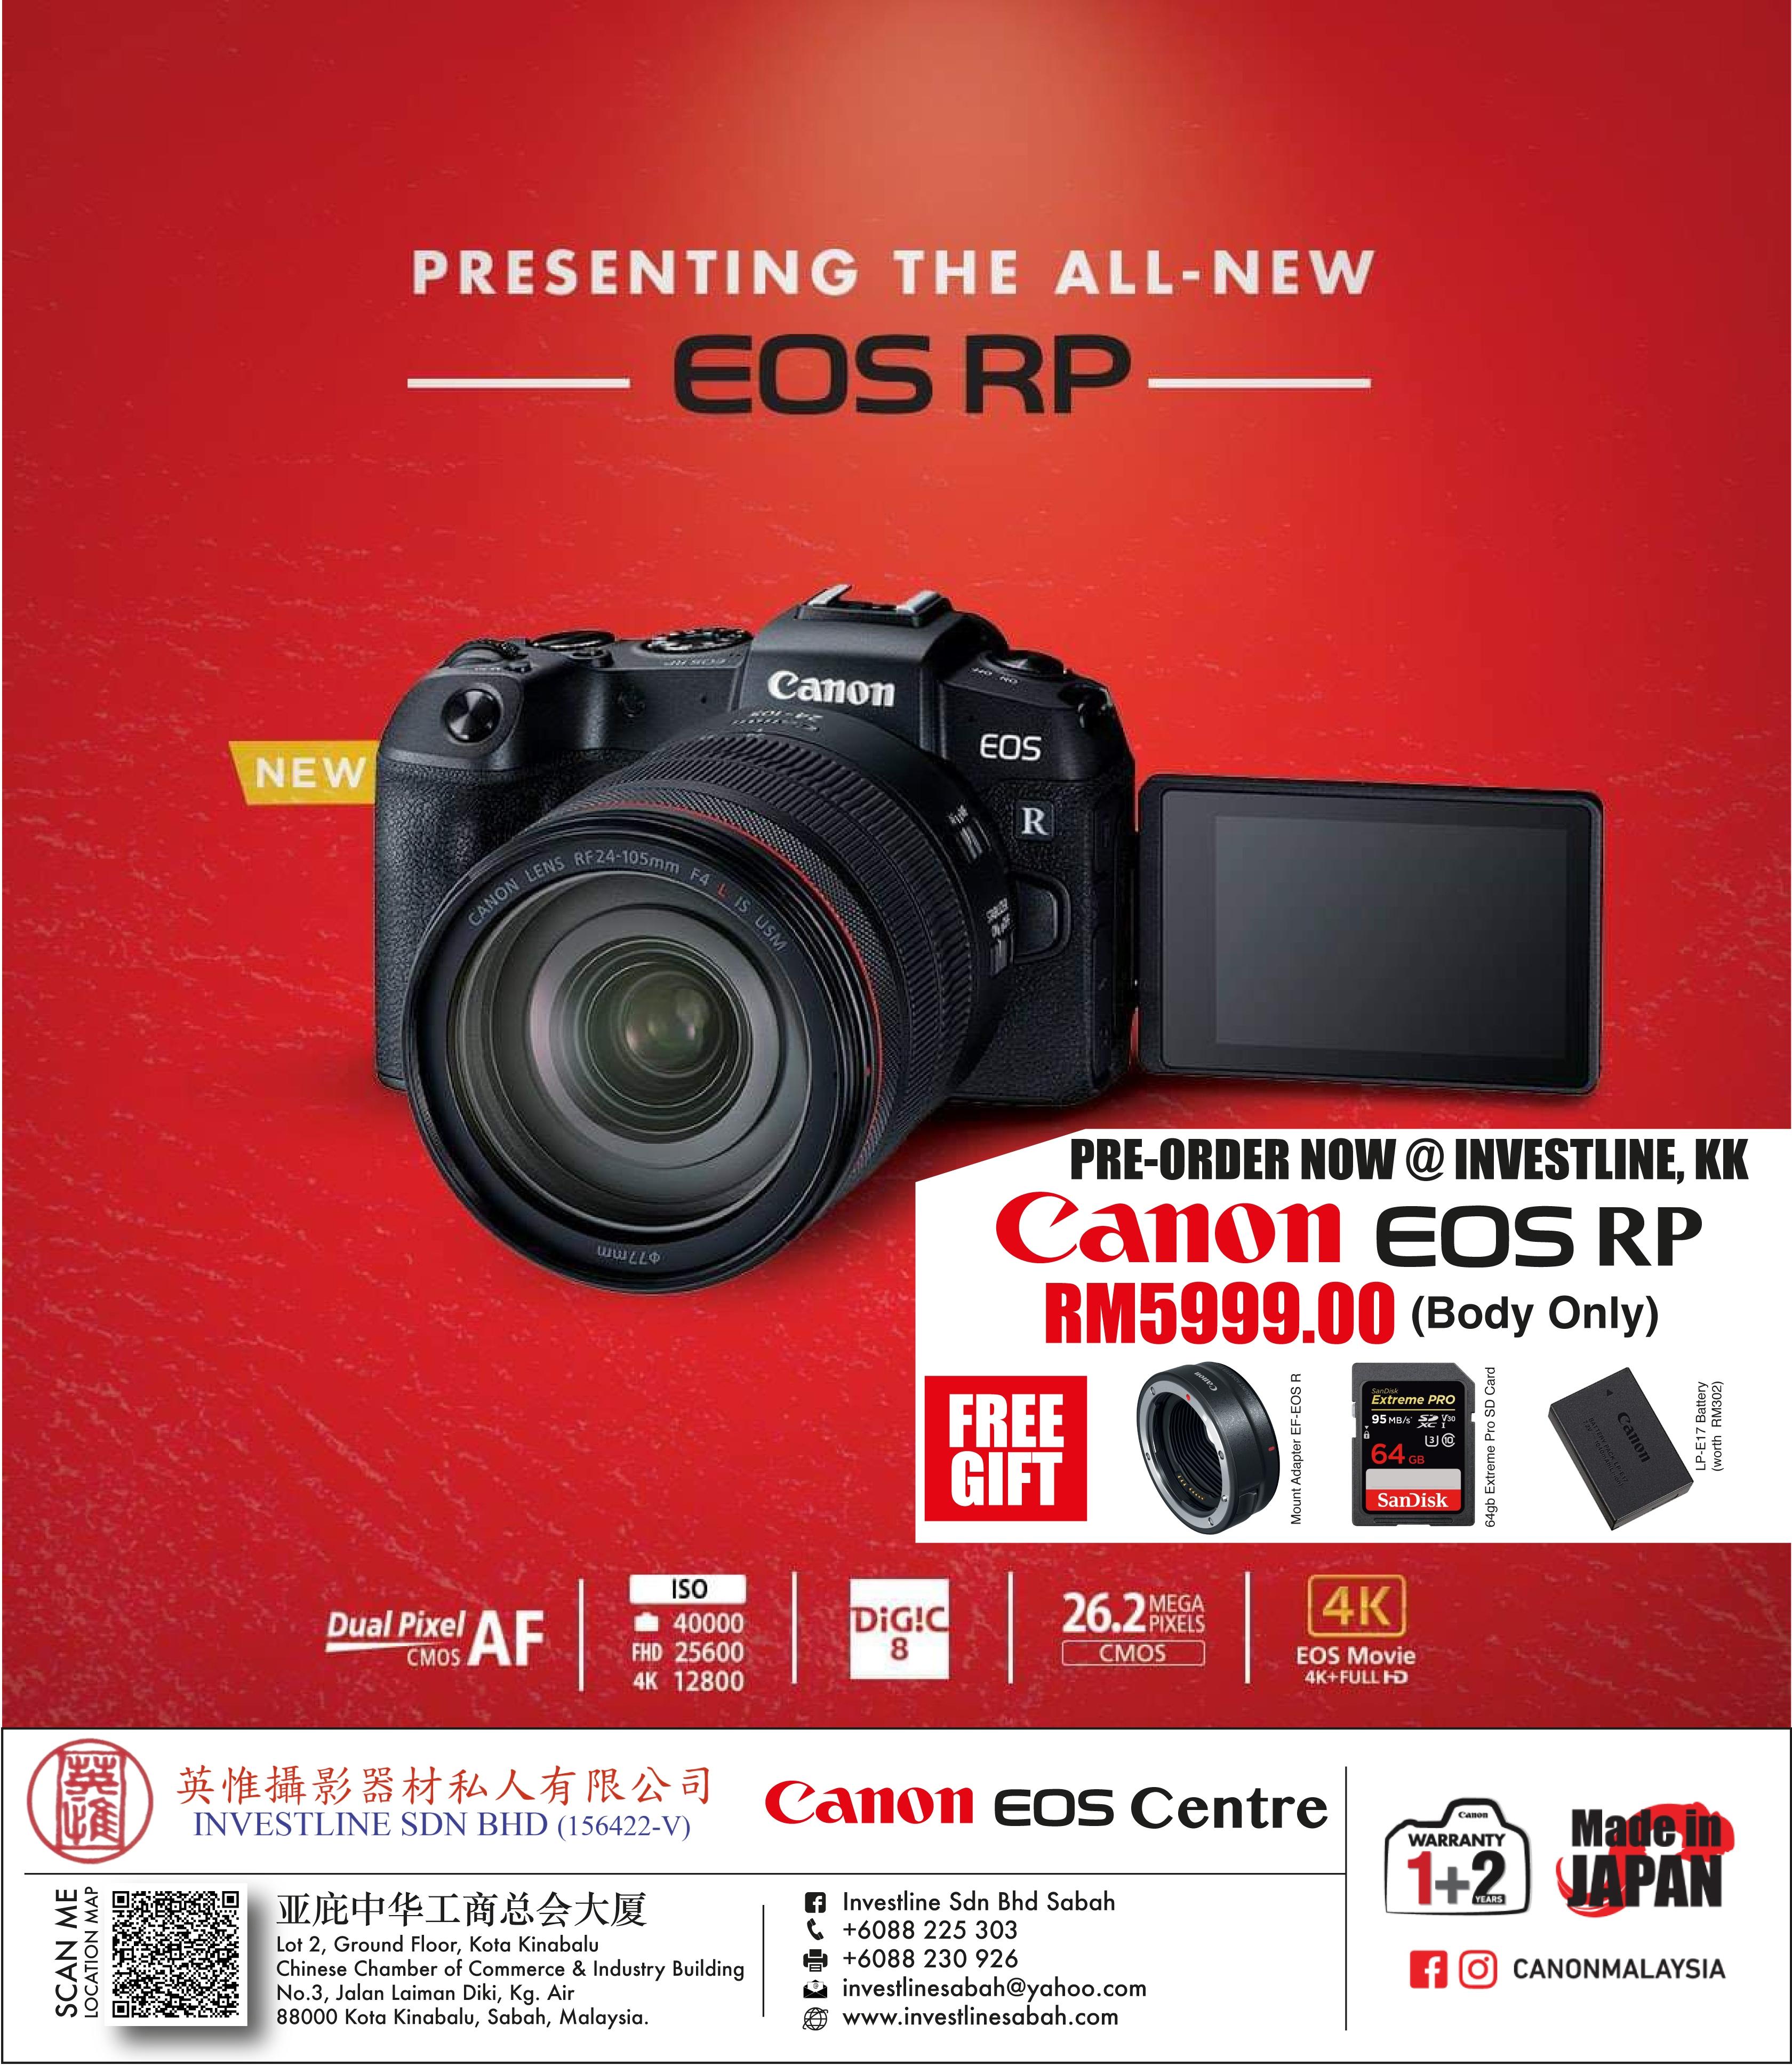 Pre-Order Canon EOS RP @ Investline KK